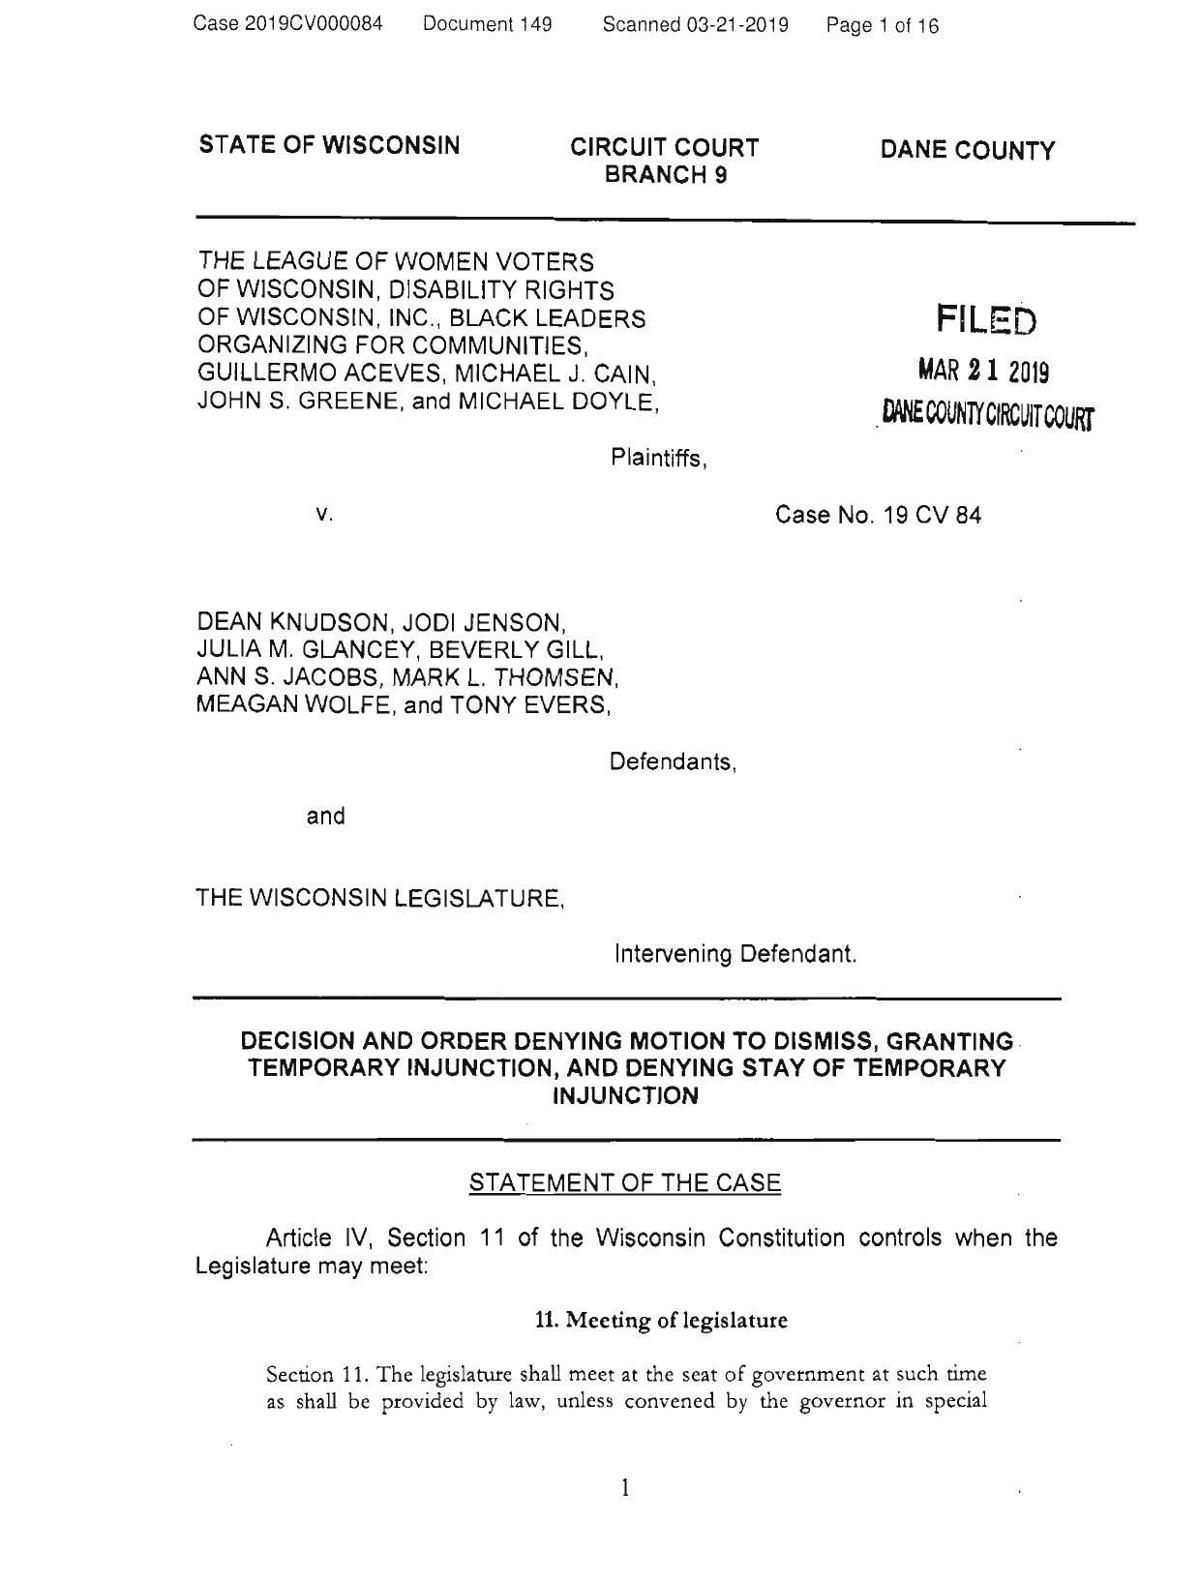 Read Judge Richard Niess' order